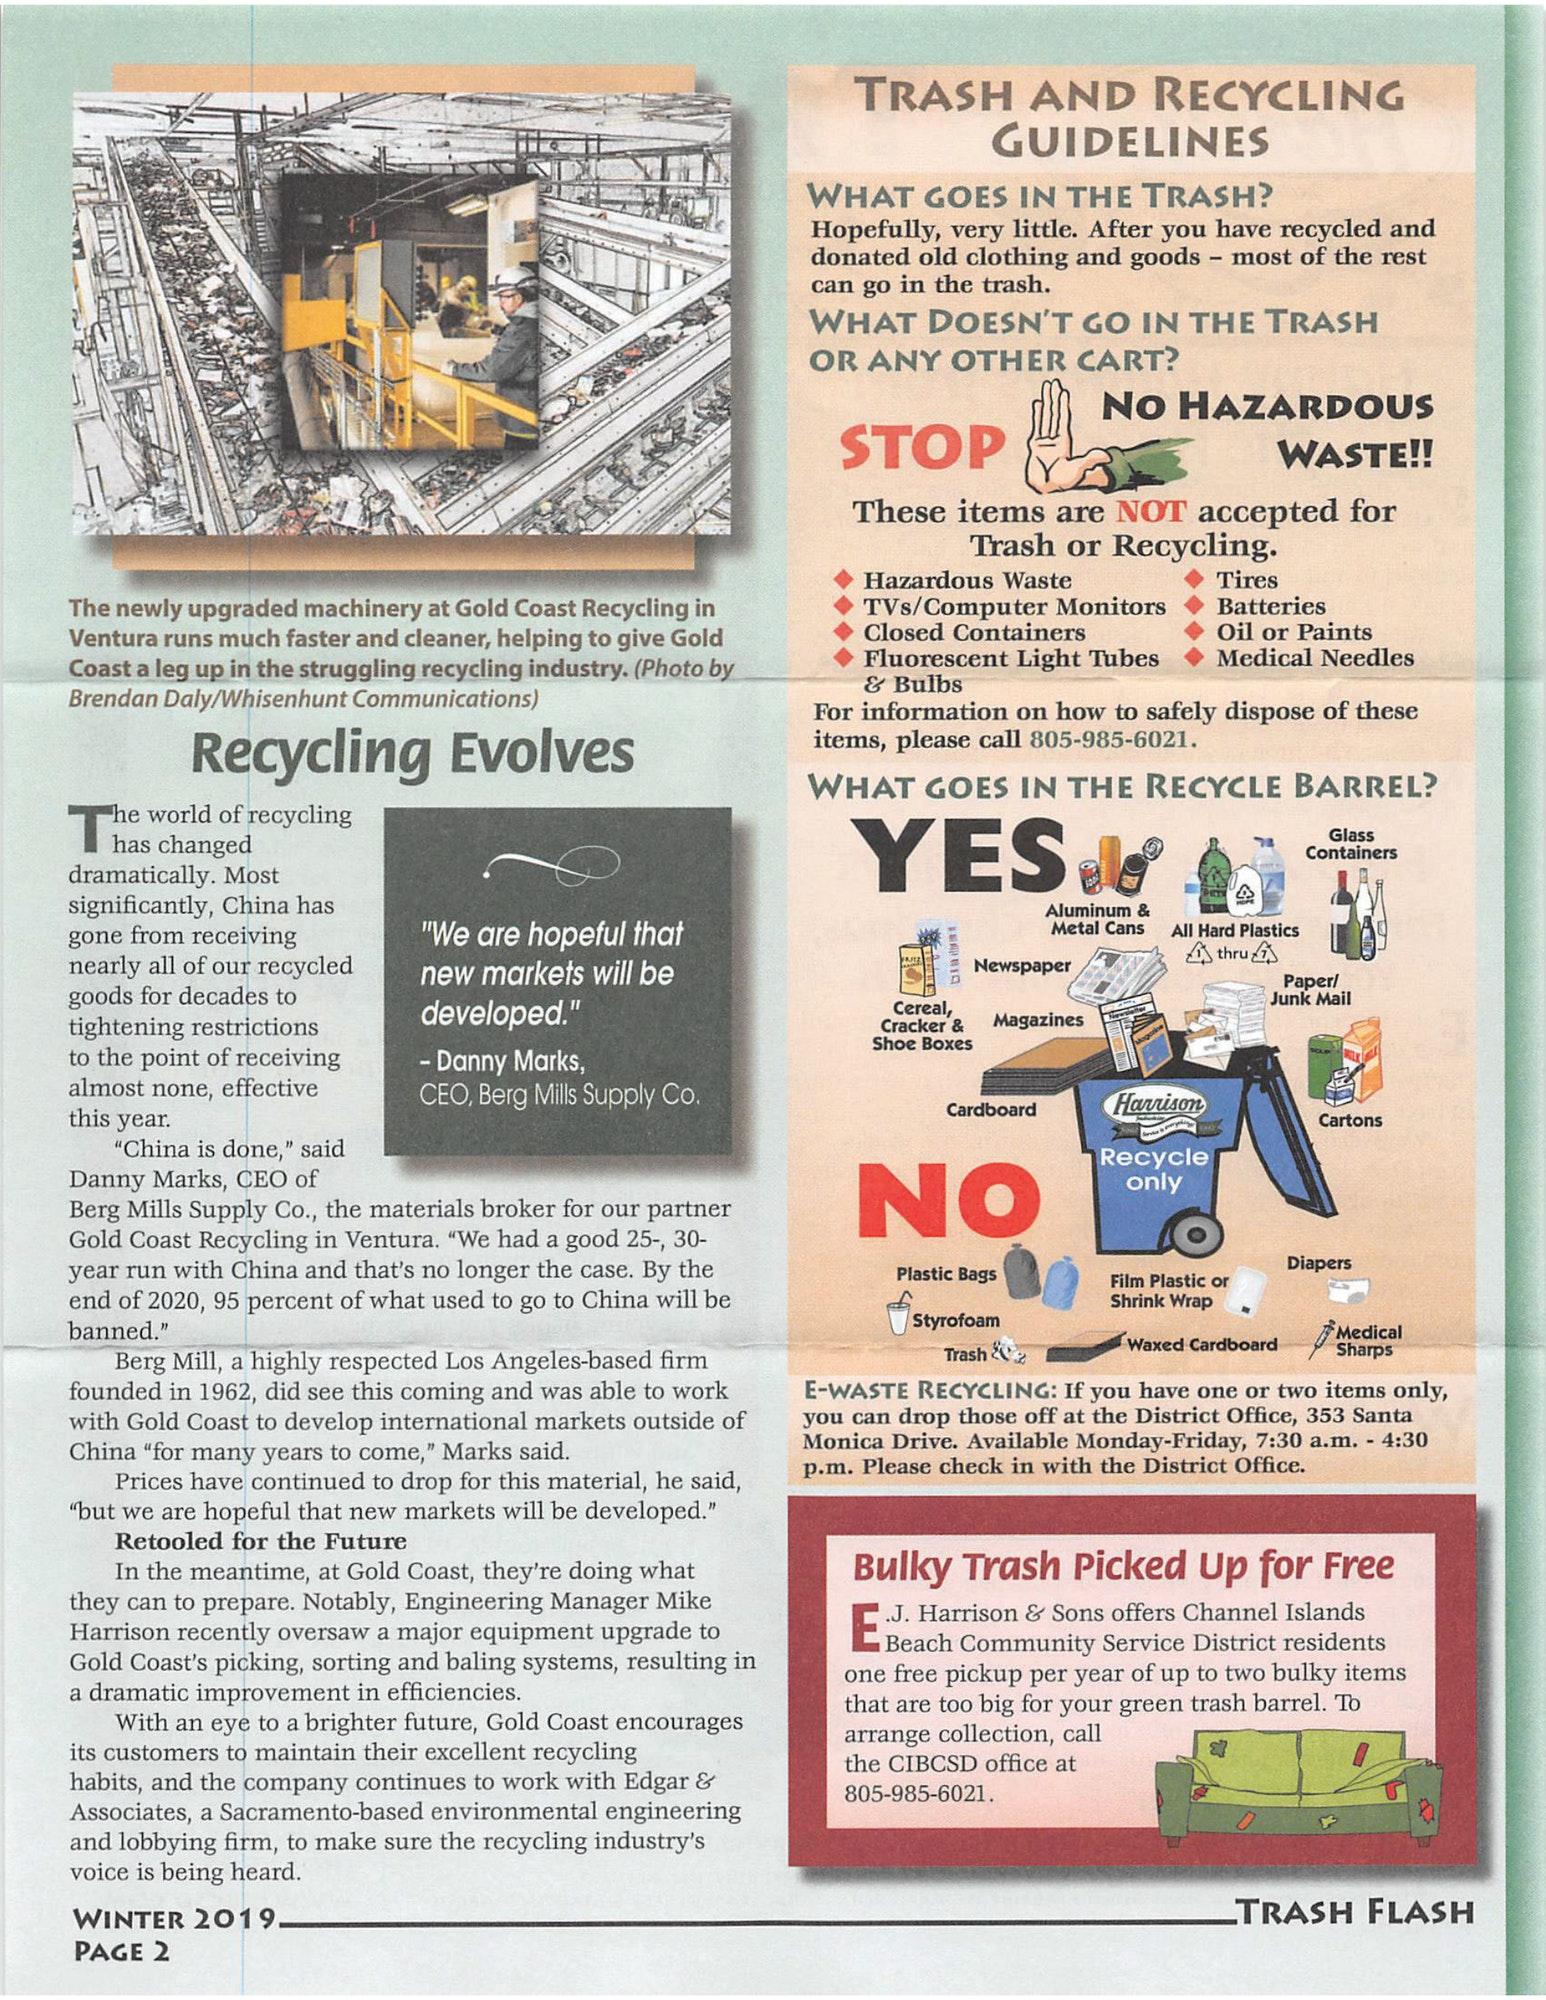 EJ Trash Flash Winter 2019 page 2